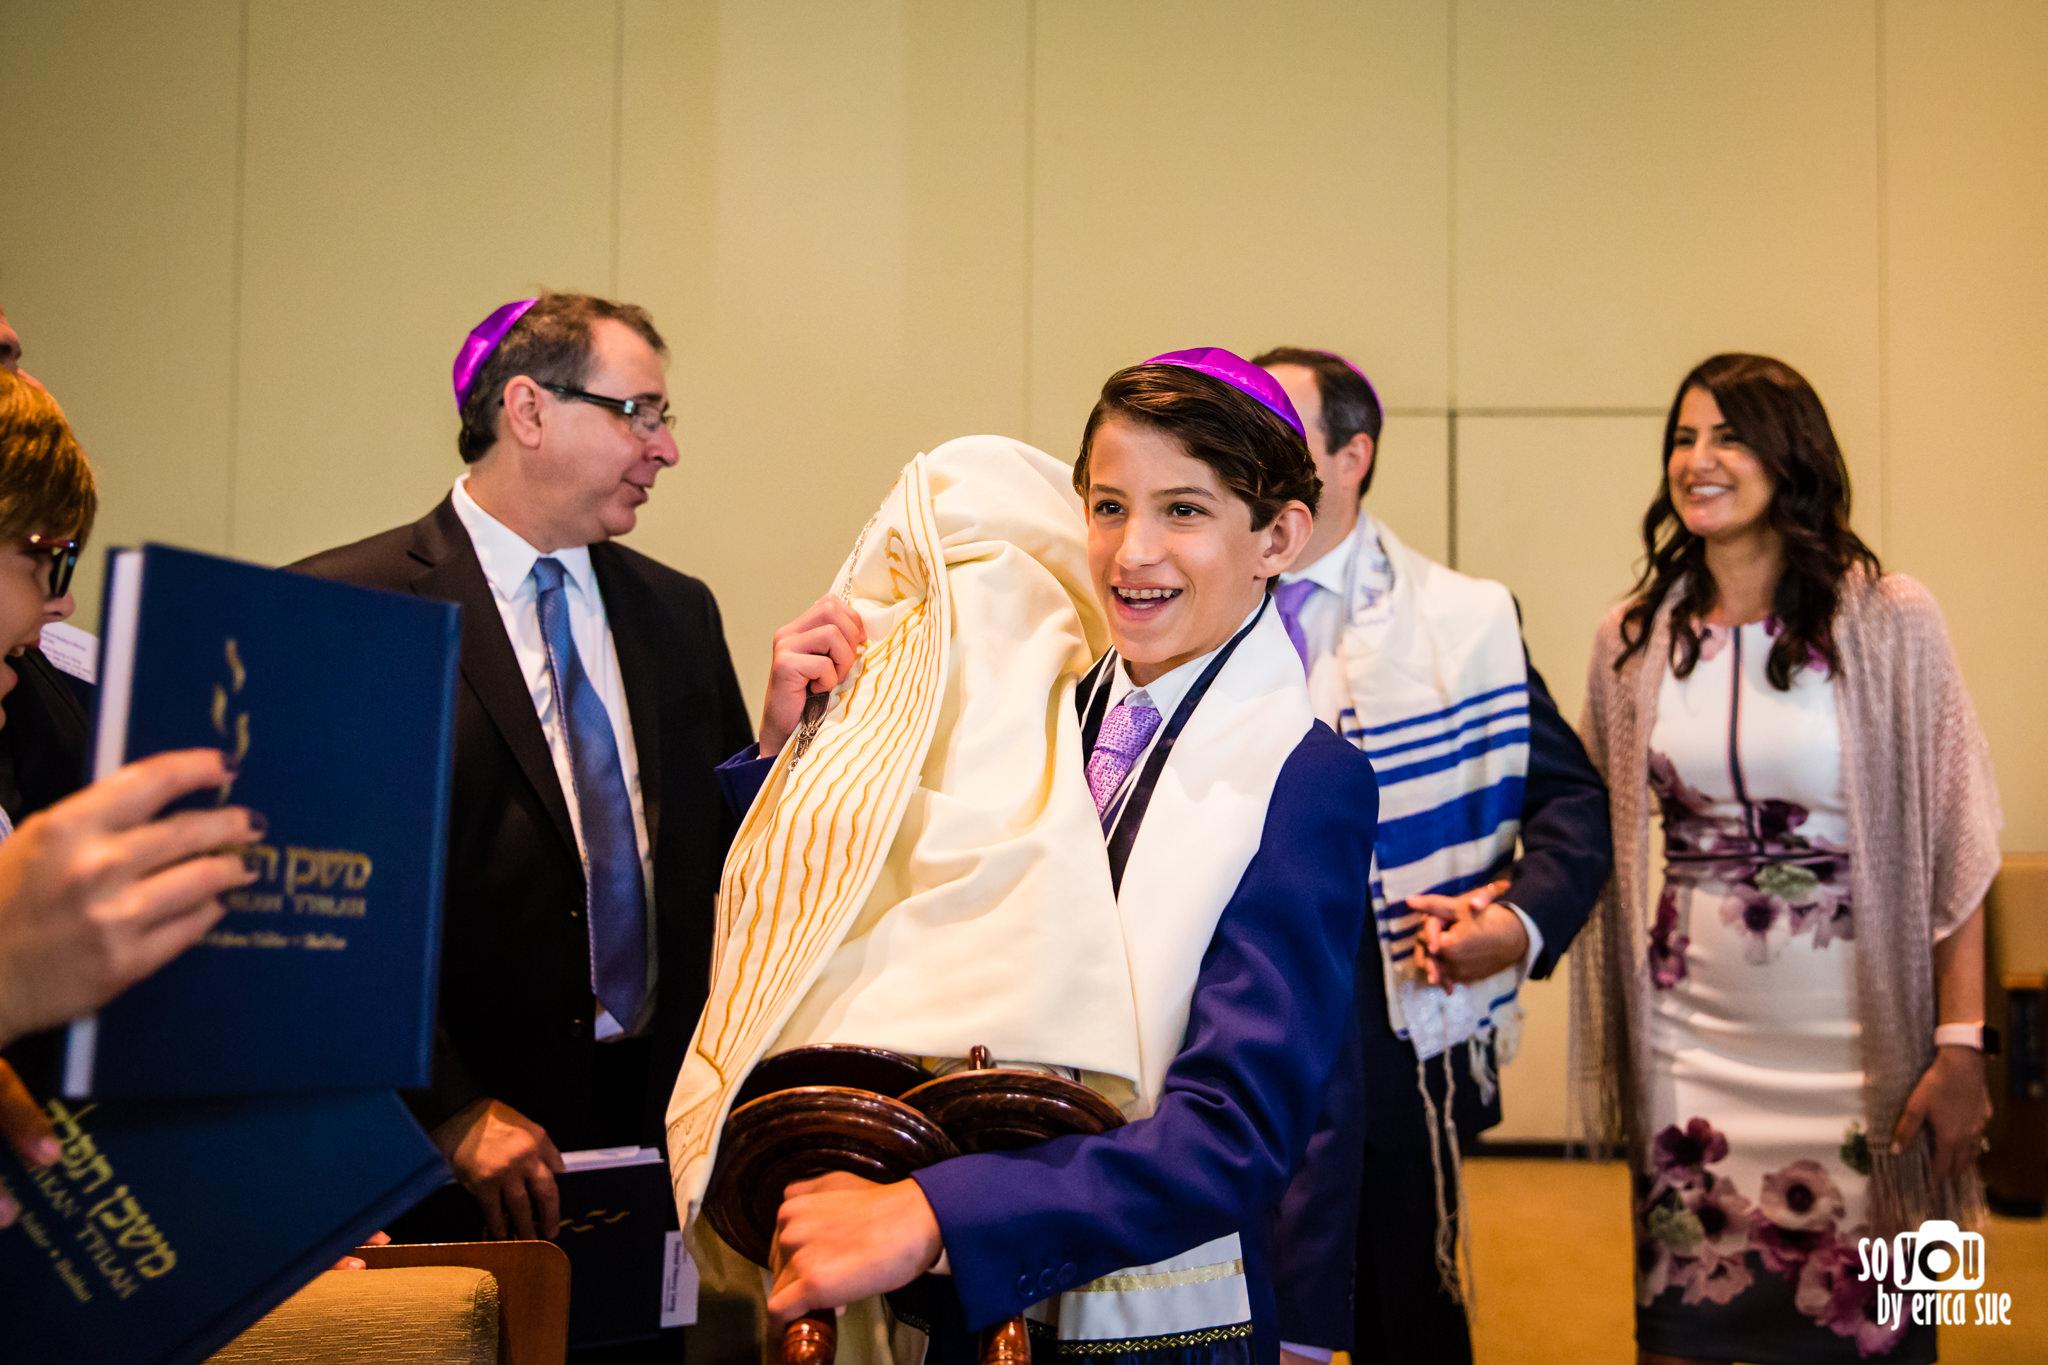 so-you-by-erica-beth-am-university-of-miami-um-bar-mitzvah-photographer-5121.JPG